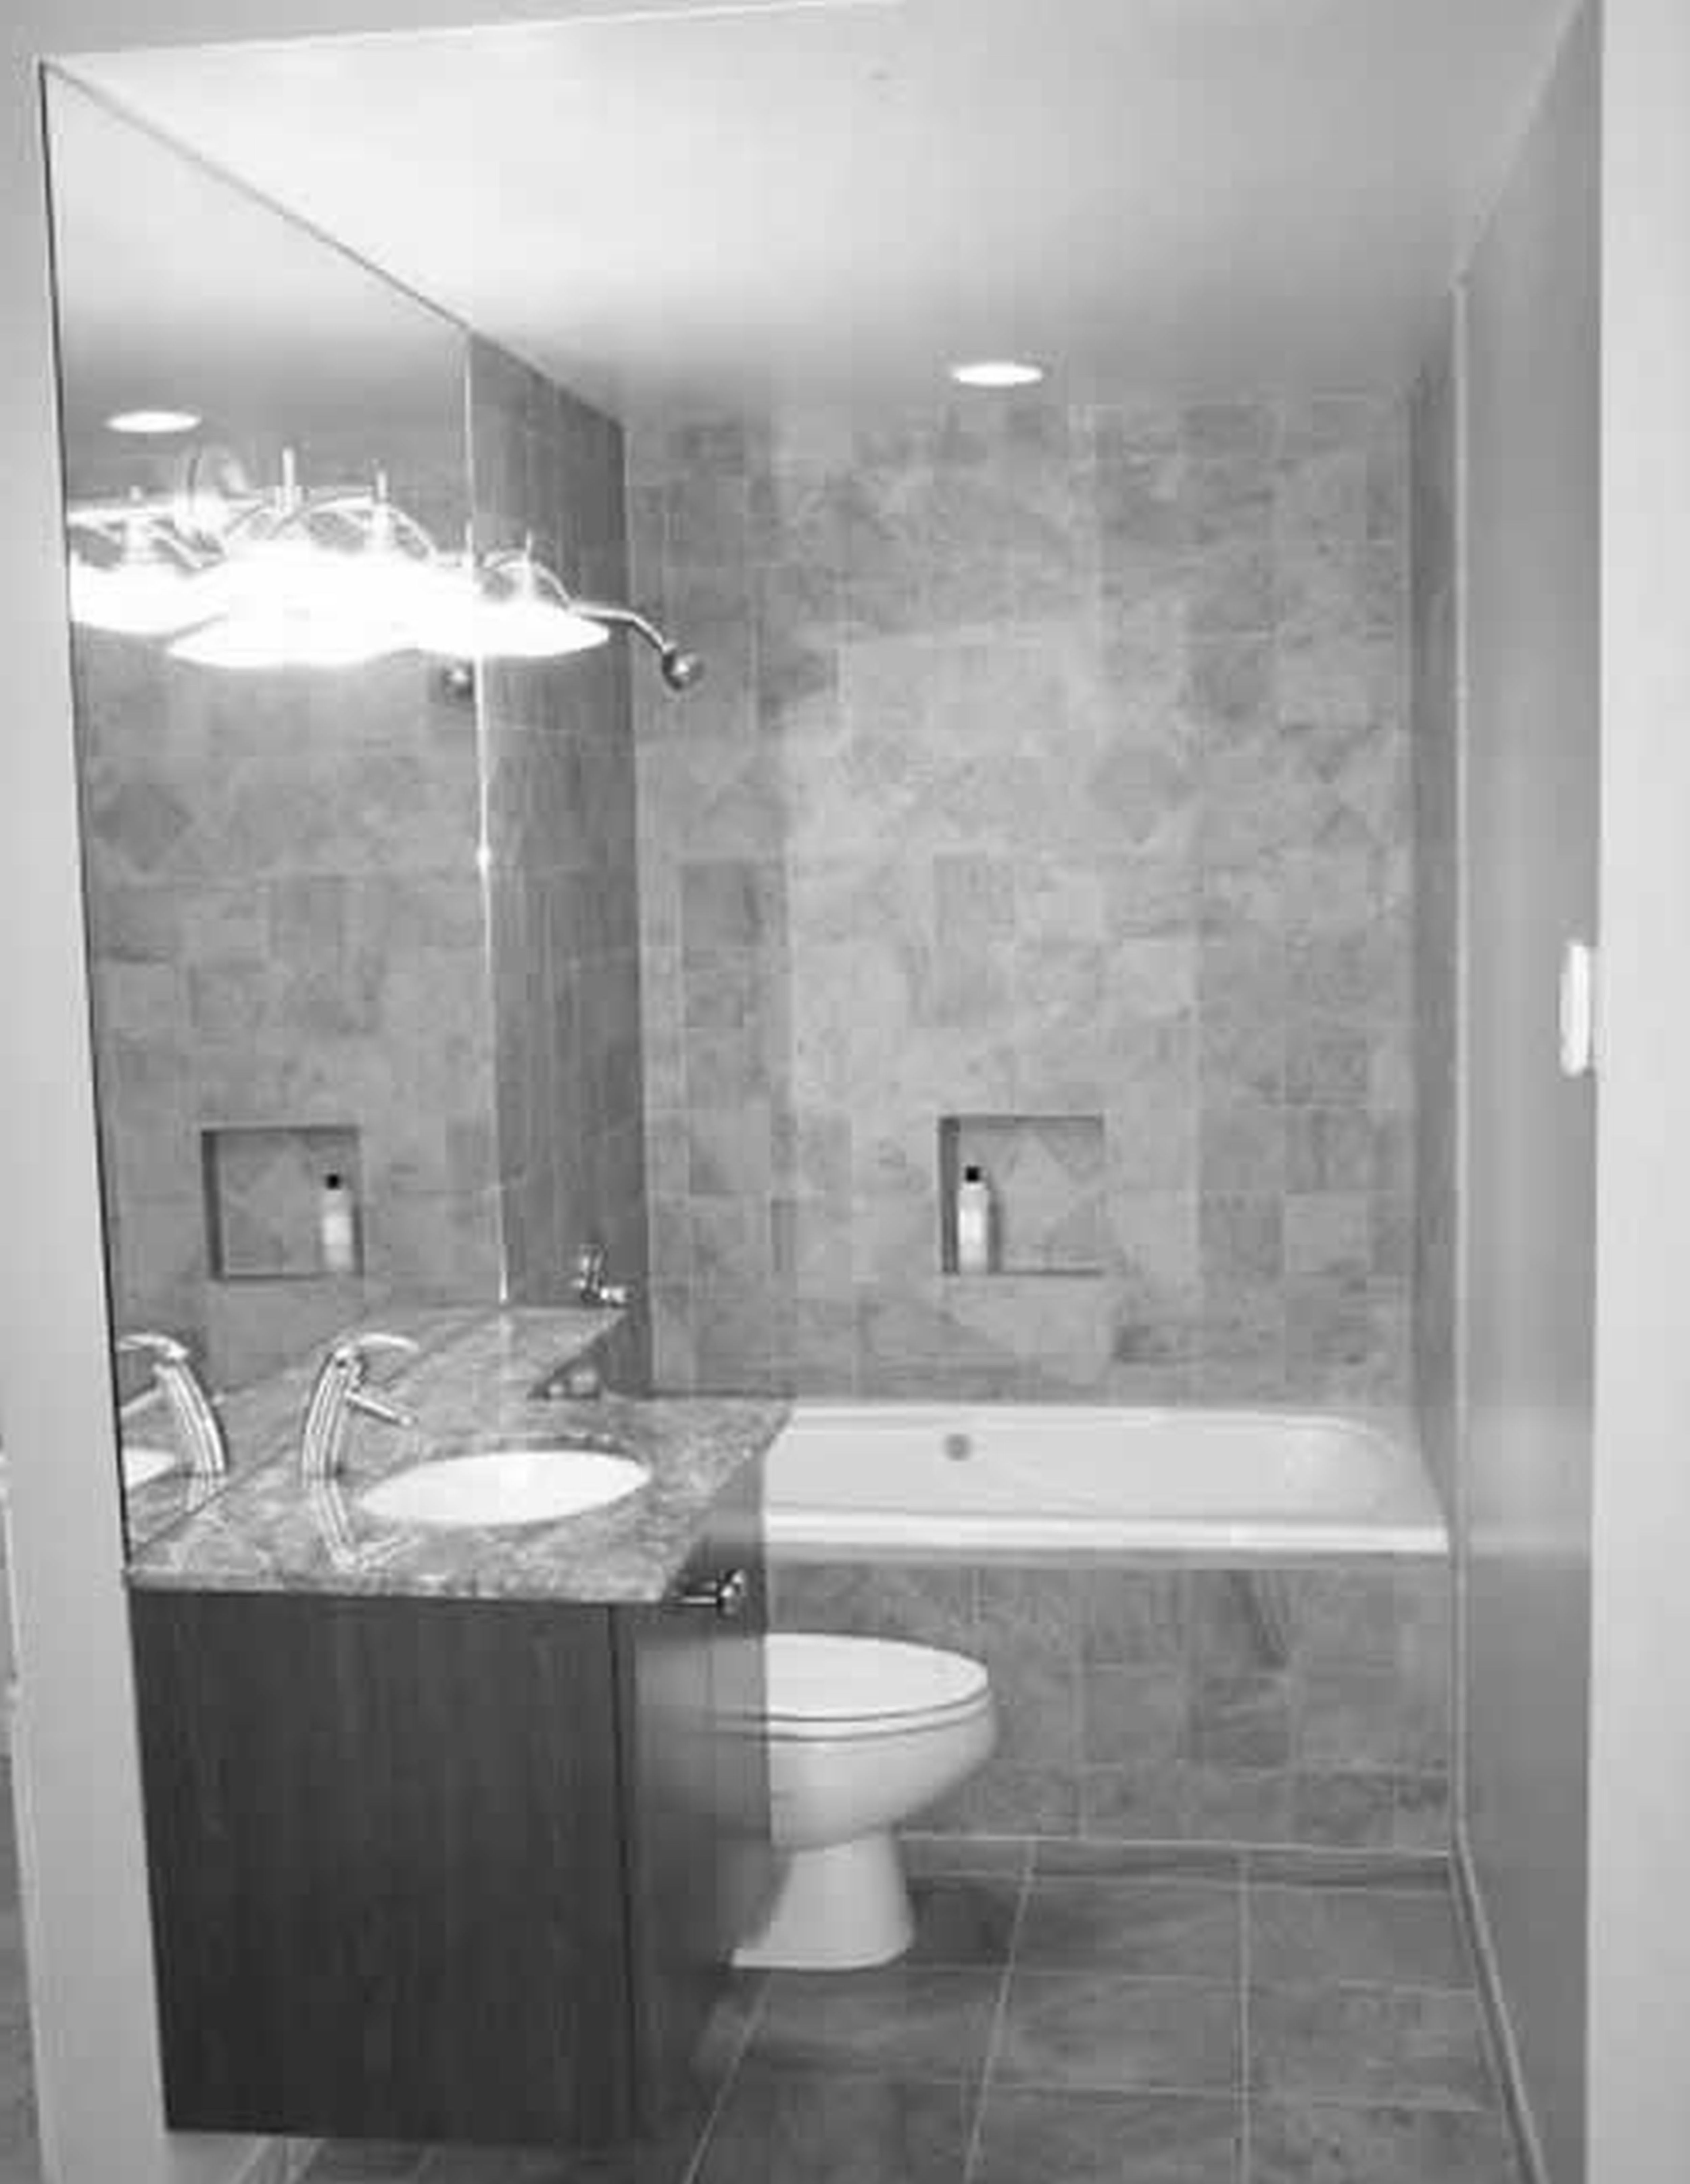 The Best Luxury Small Bathroom Tiles Design Philippines IJ4jke